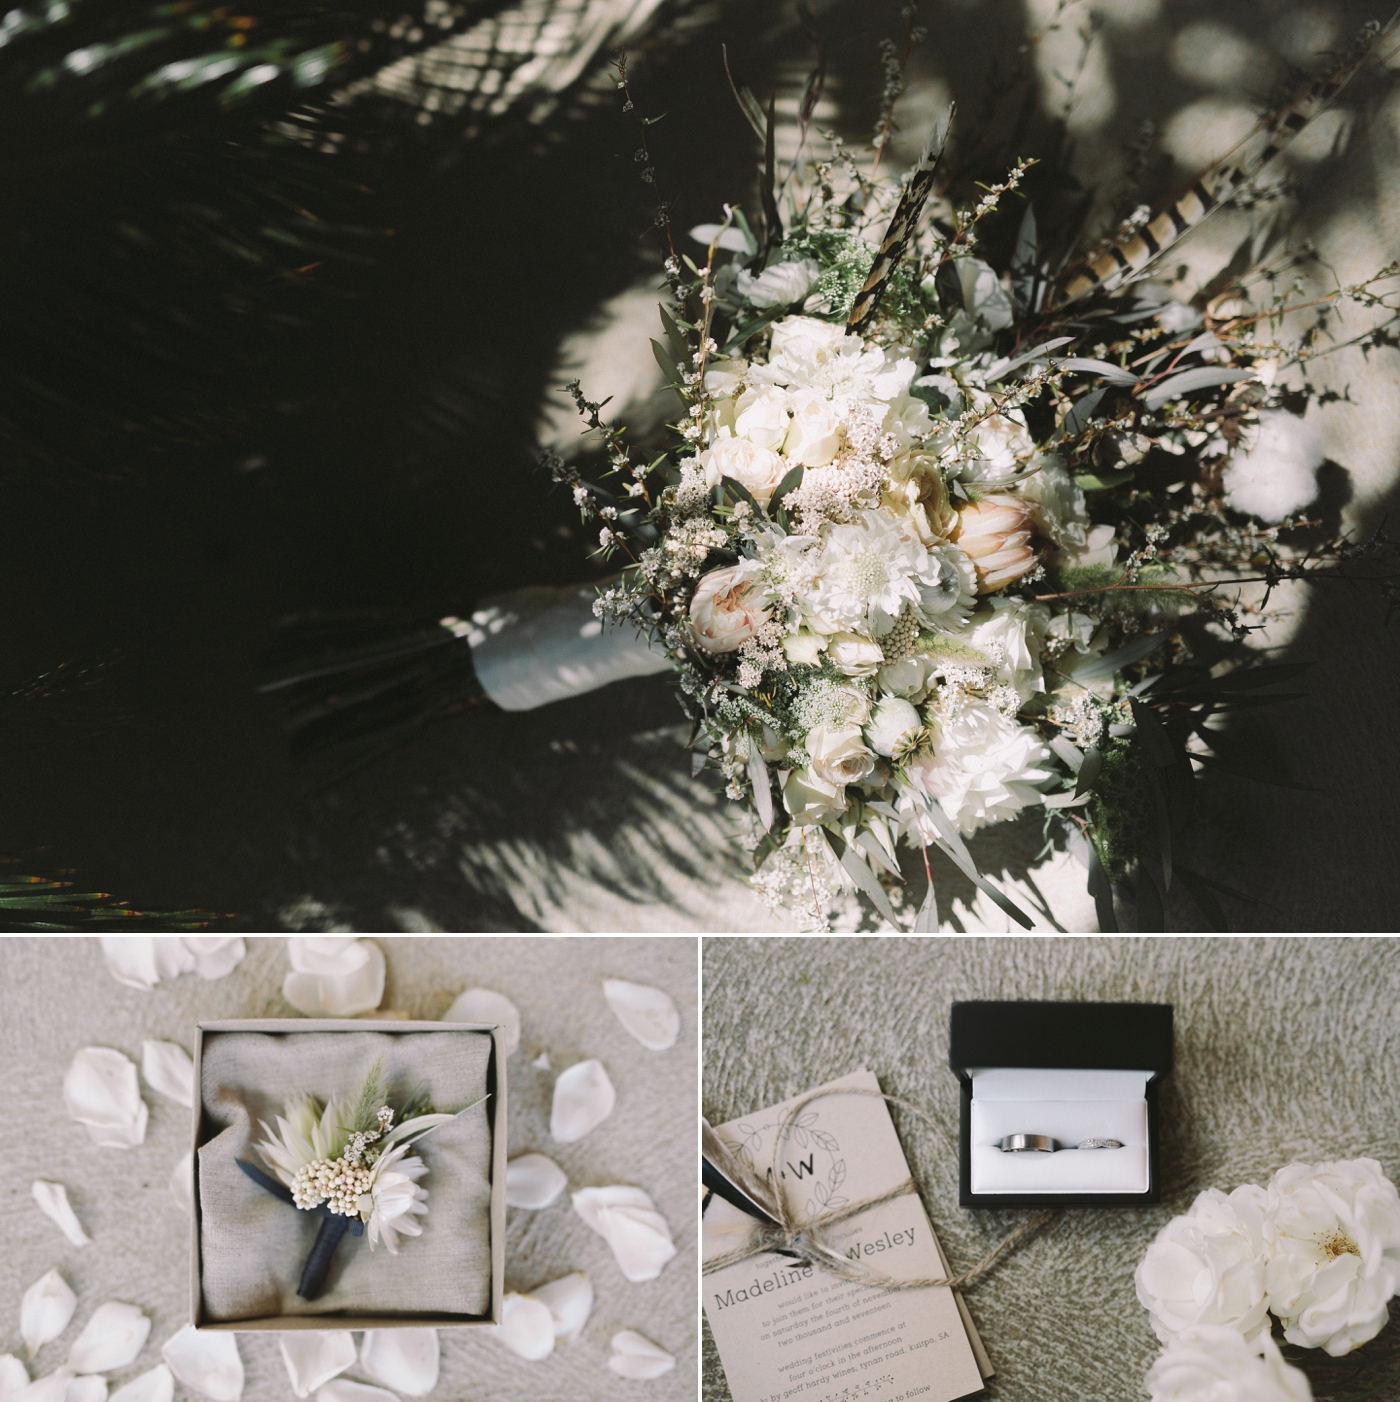 Maddy & Wes - K1 by Geoff Hardy Wedding - Adelaide Wedding Photographer - Natural wedding photography in Adelaide - Katherine Schultz_0002.jpg